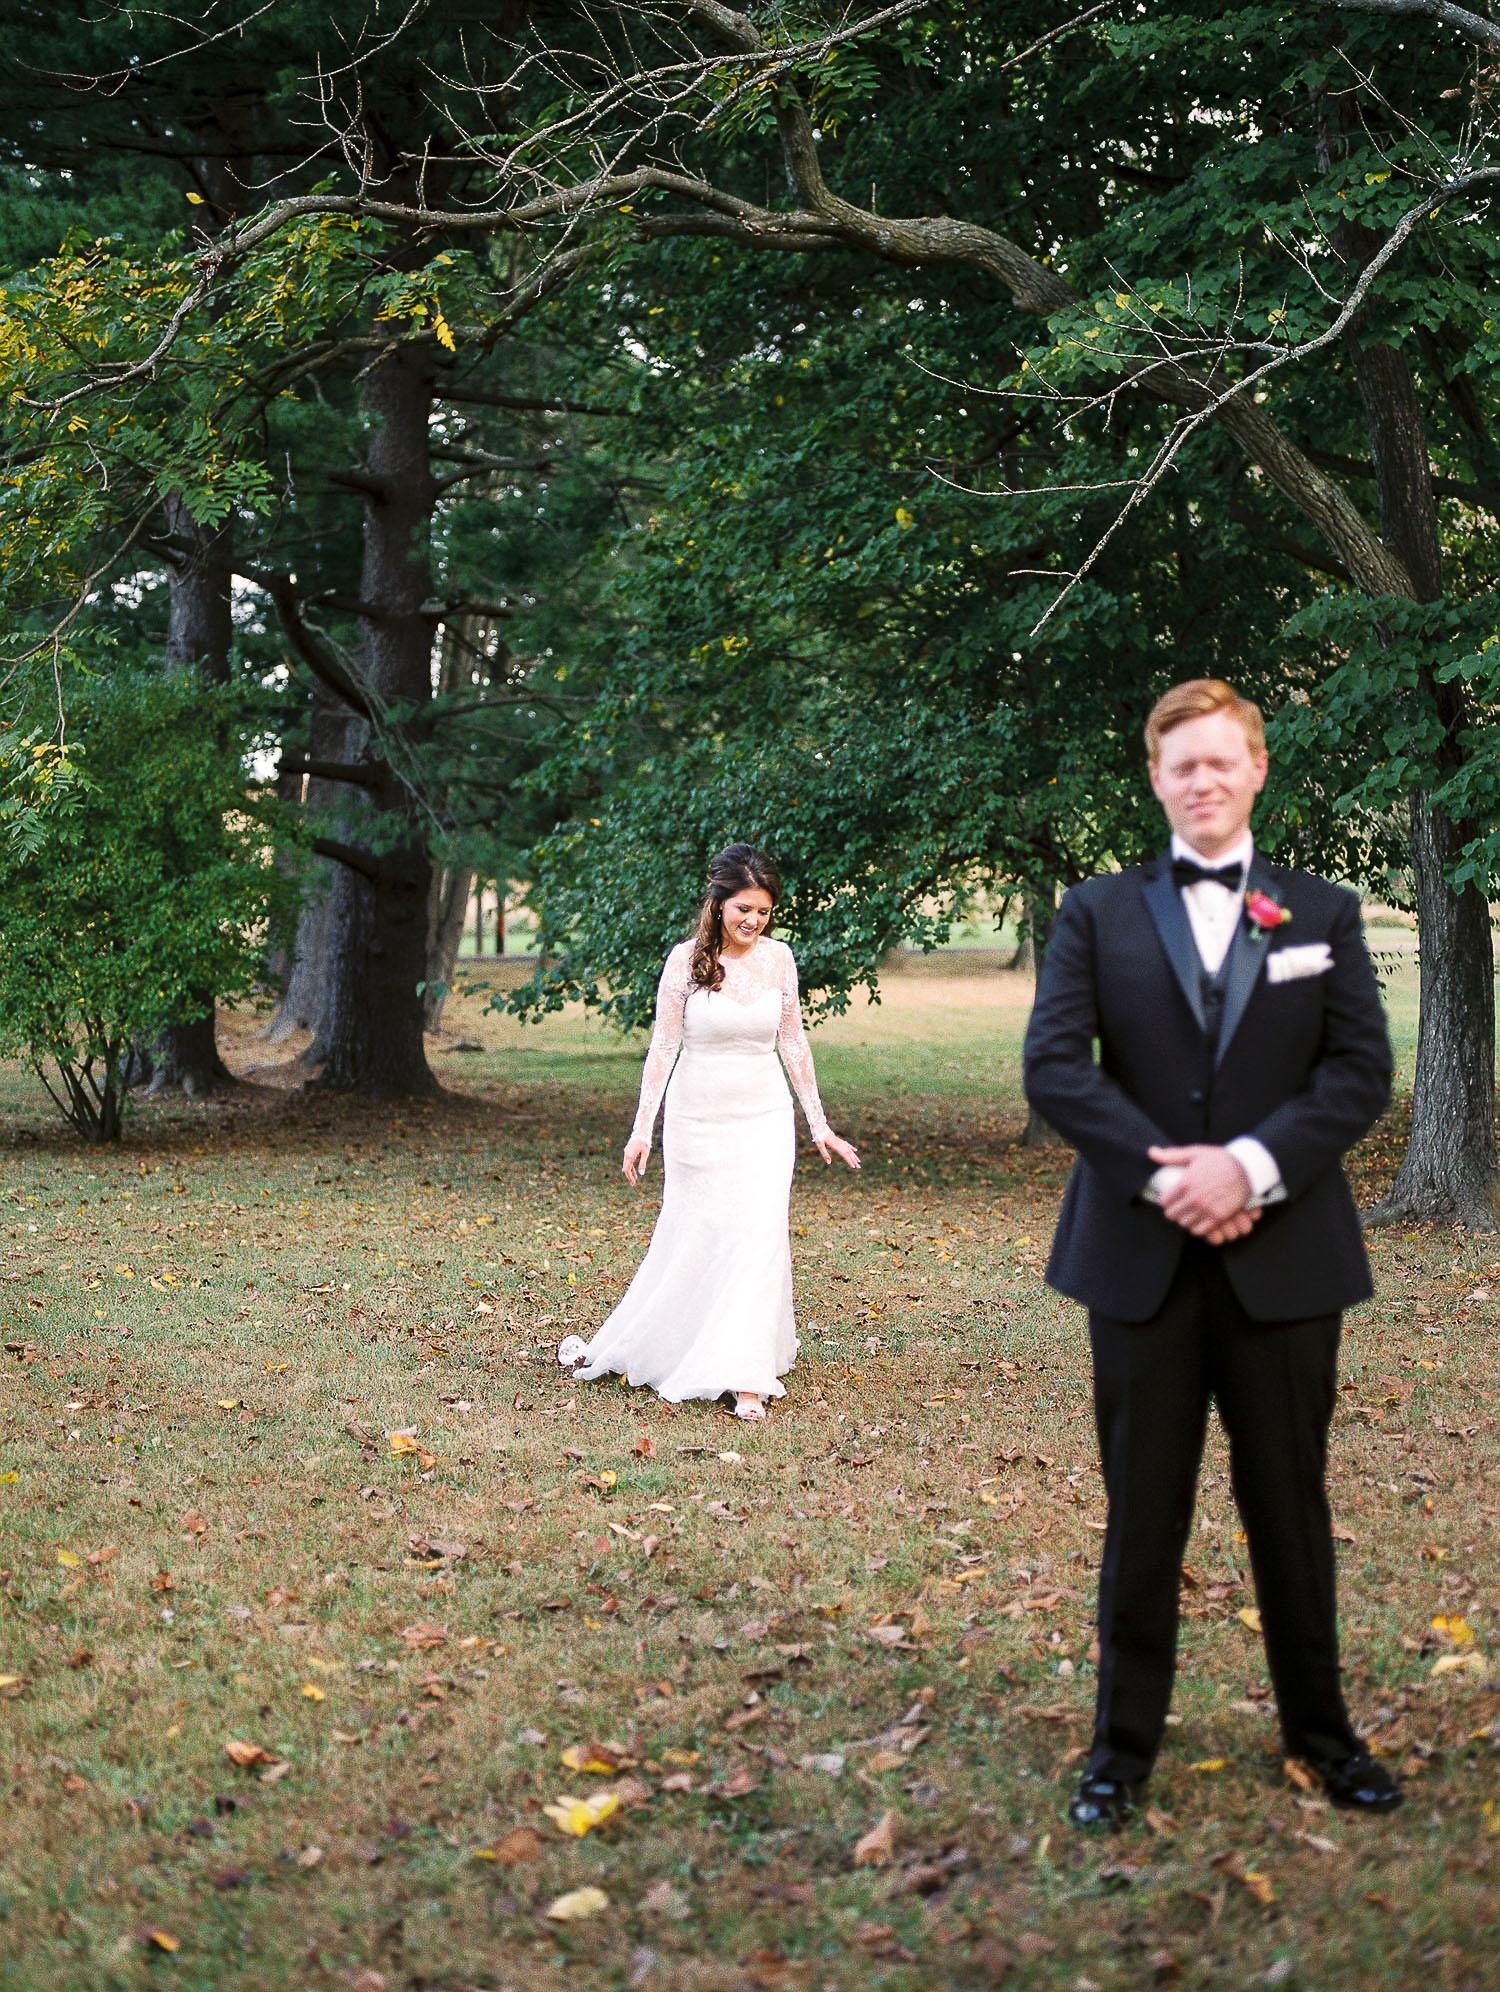 du_soleil_photographie_lookaway_golf_club_wedding_2017-10